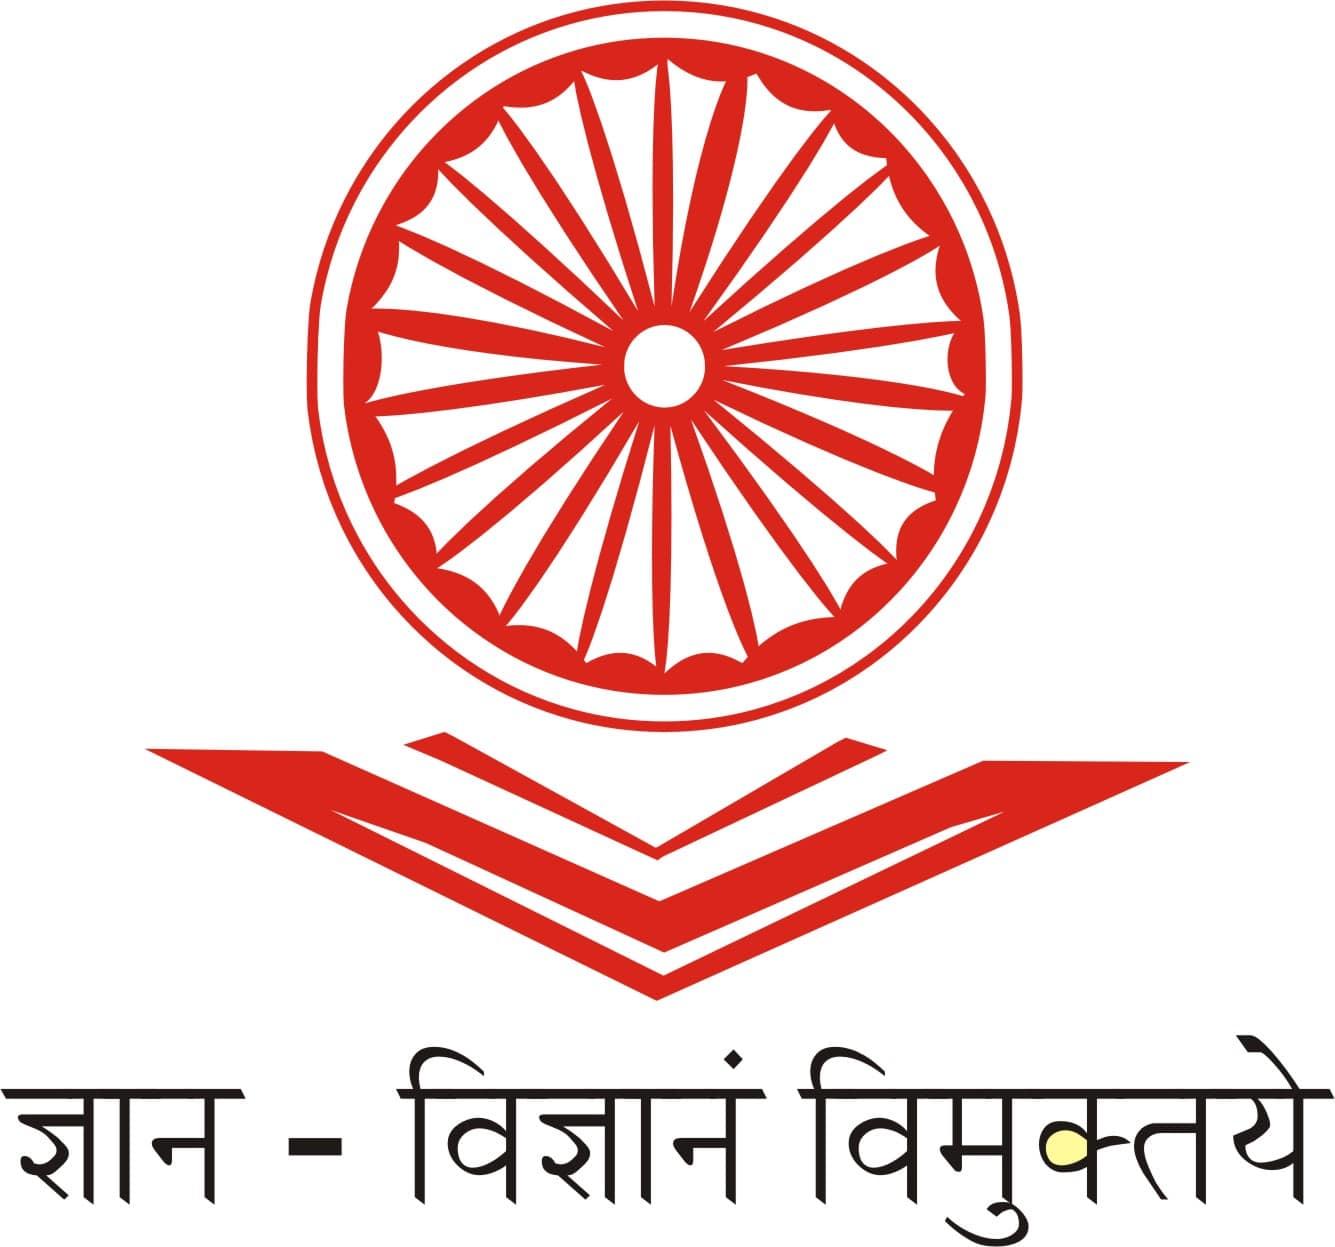 UGC seeks public feedback for world class institutions